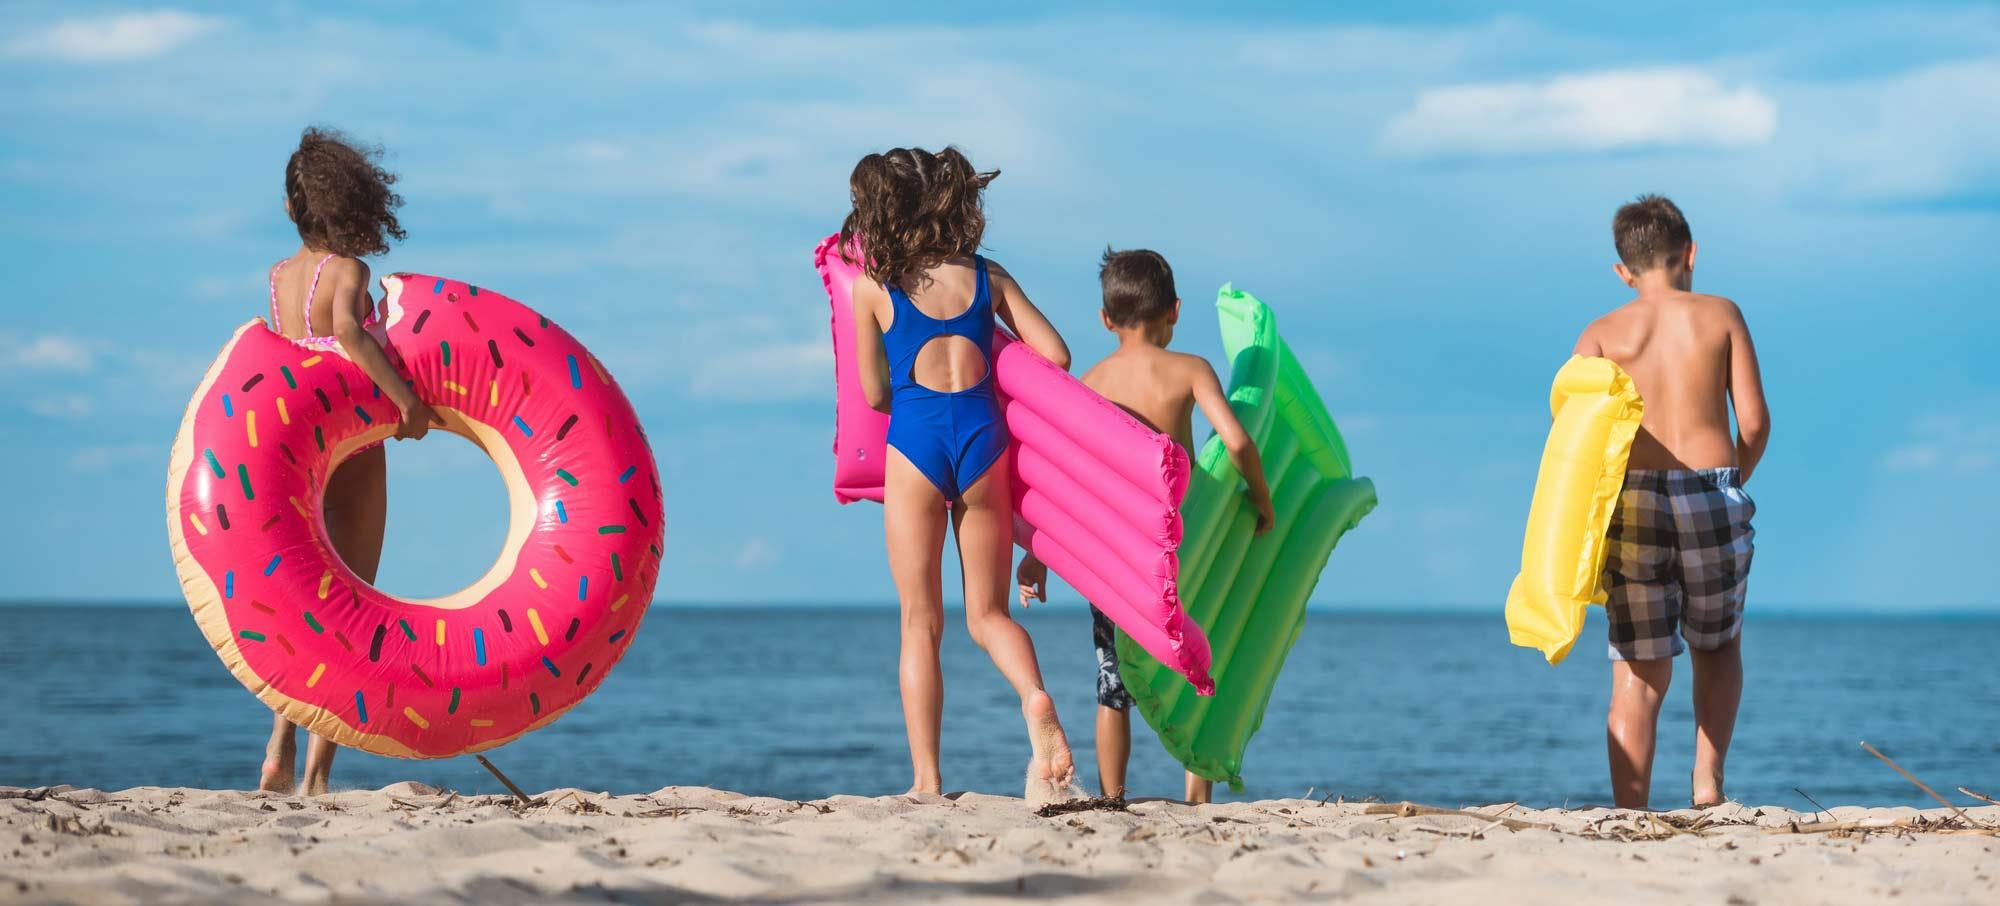 Deti an dovolenke pri mori